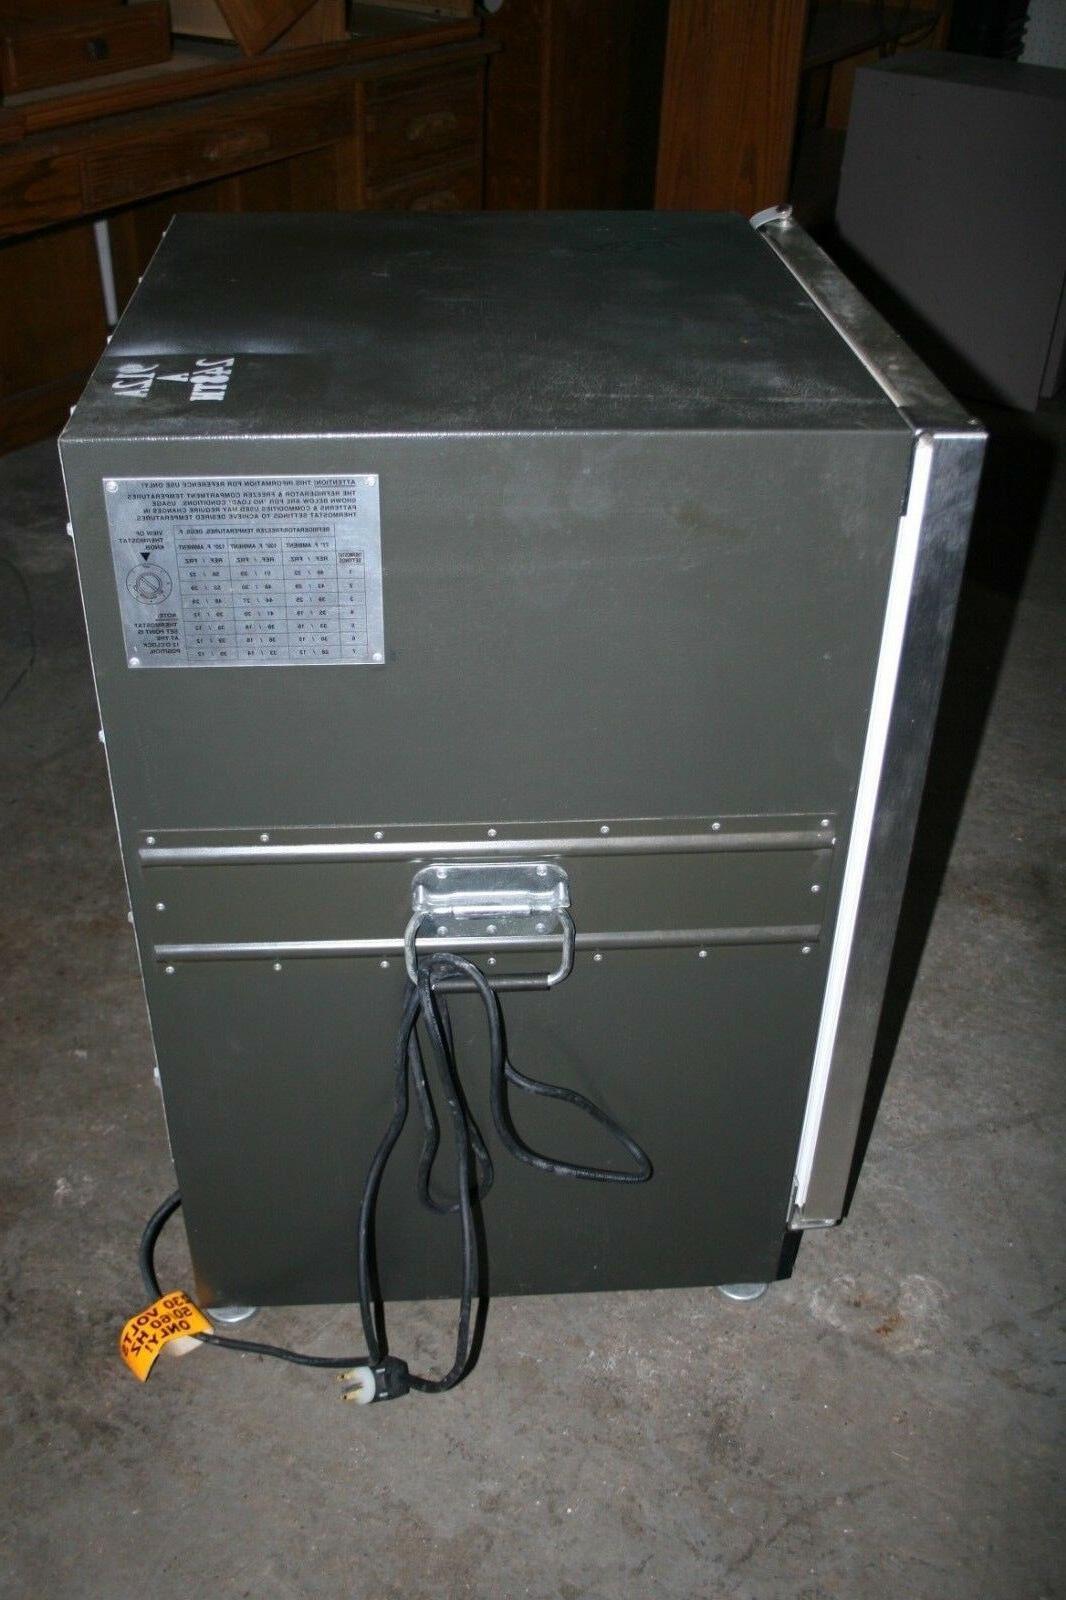 Marvel Freezer Refrigerator 6CRF0600, 115/230 Volt, 50/60 1PH